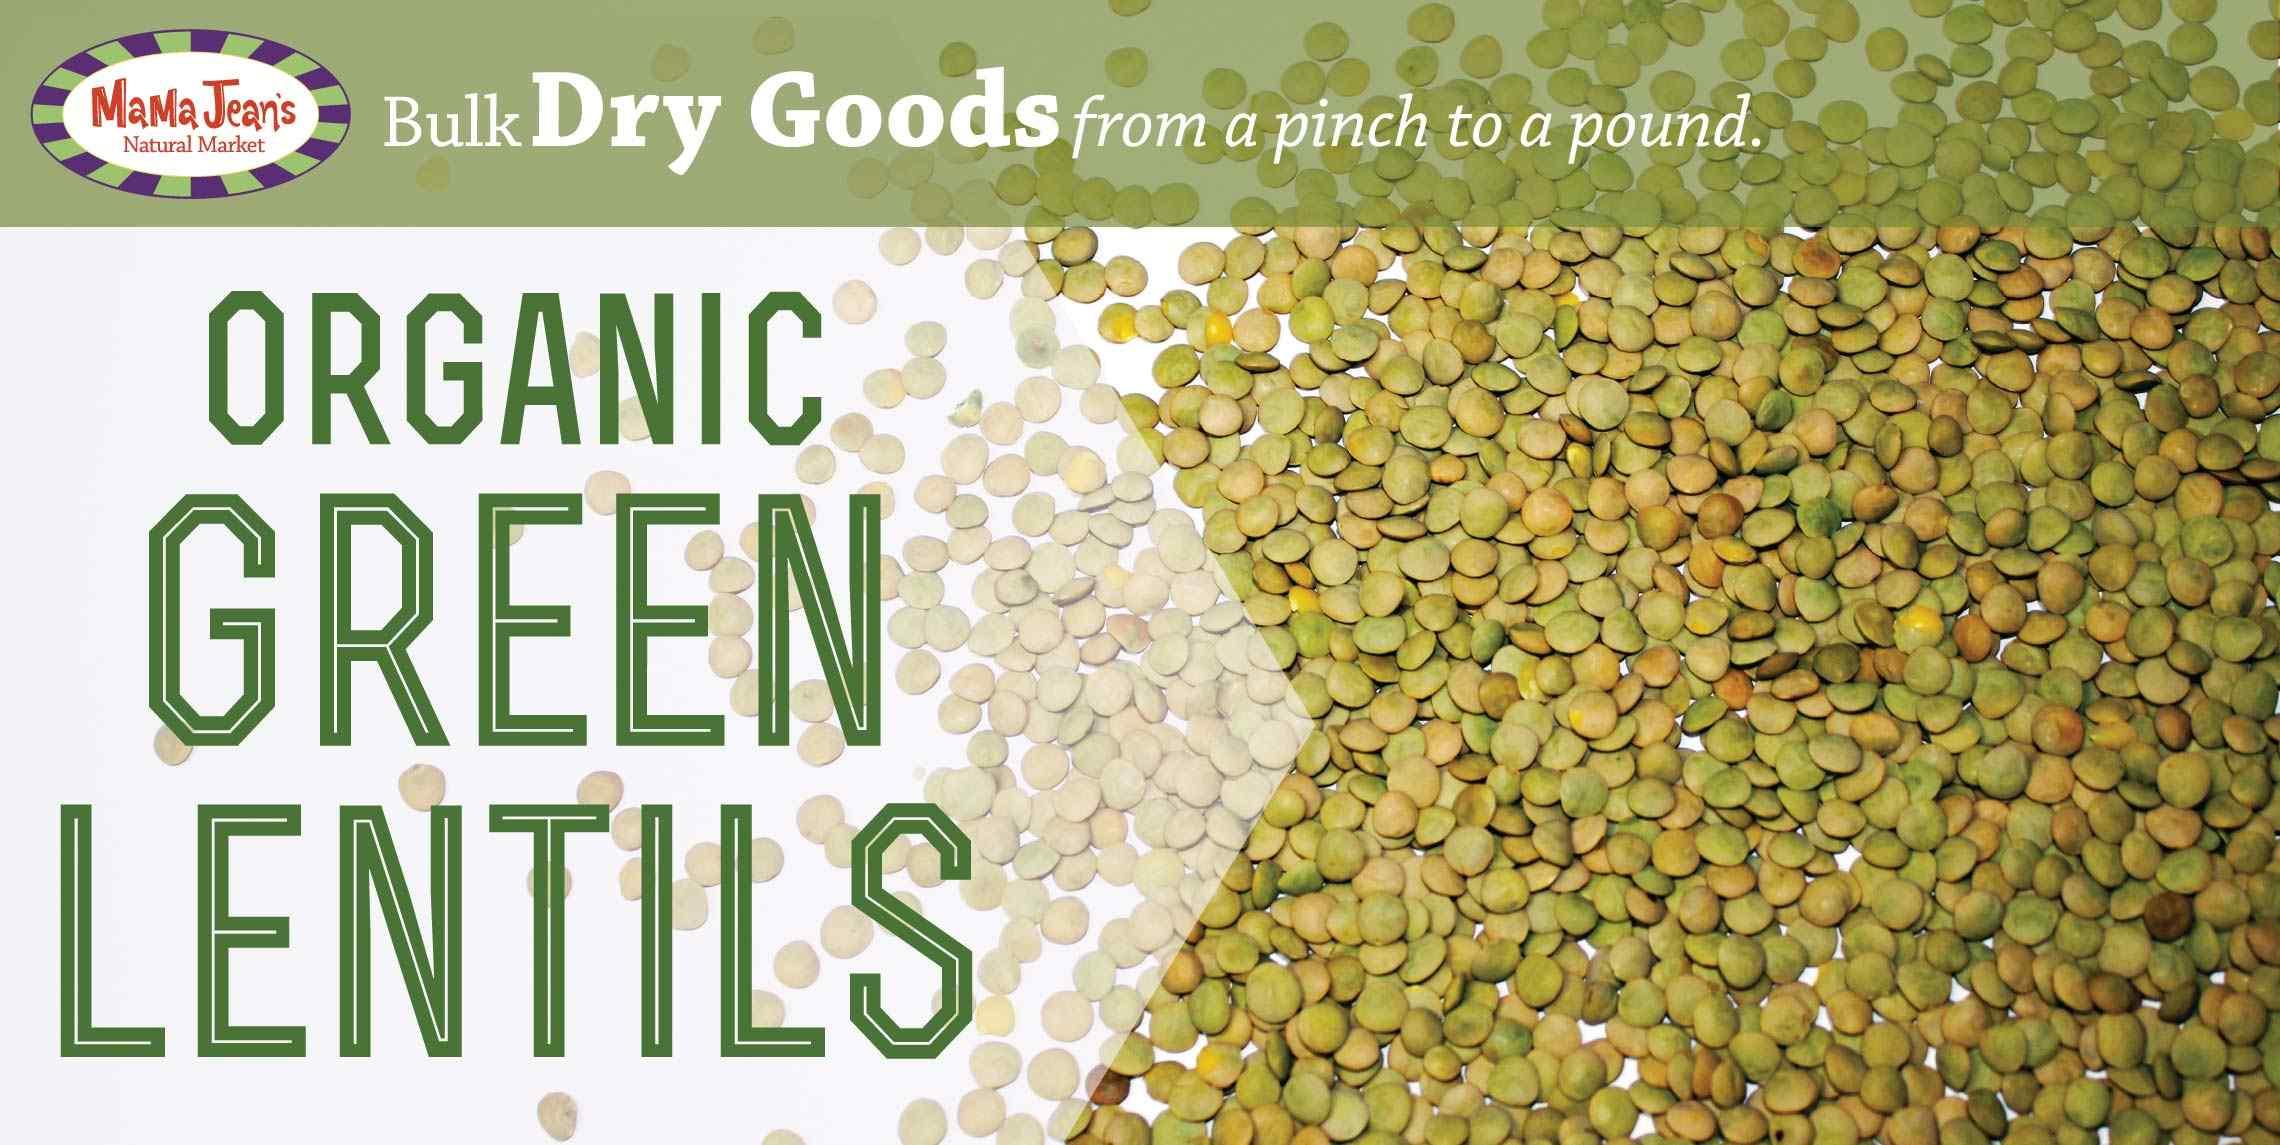 Bulk Feature: Organic Green Lentils